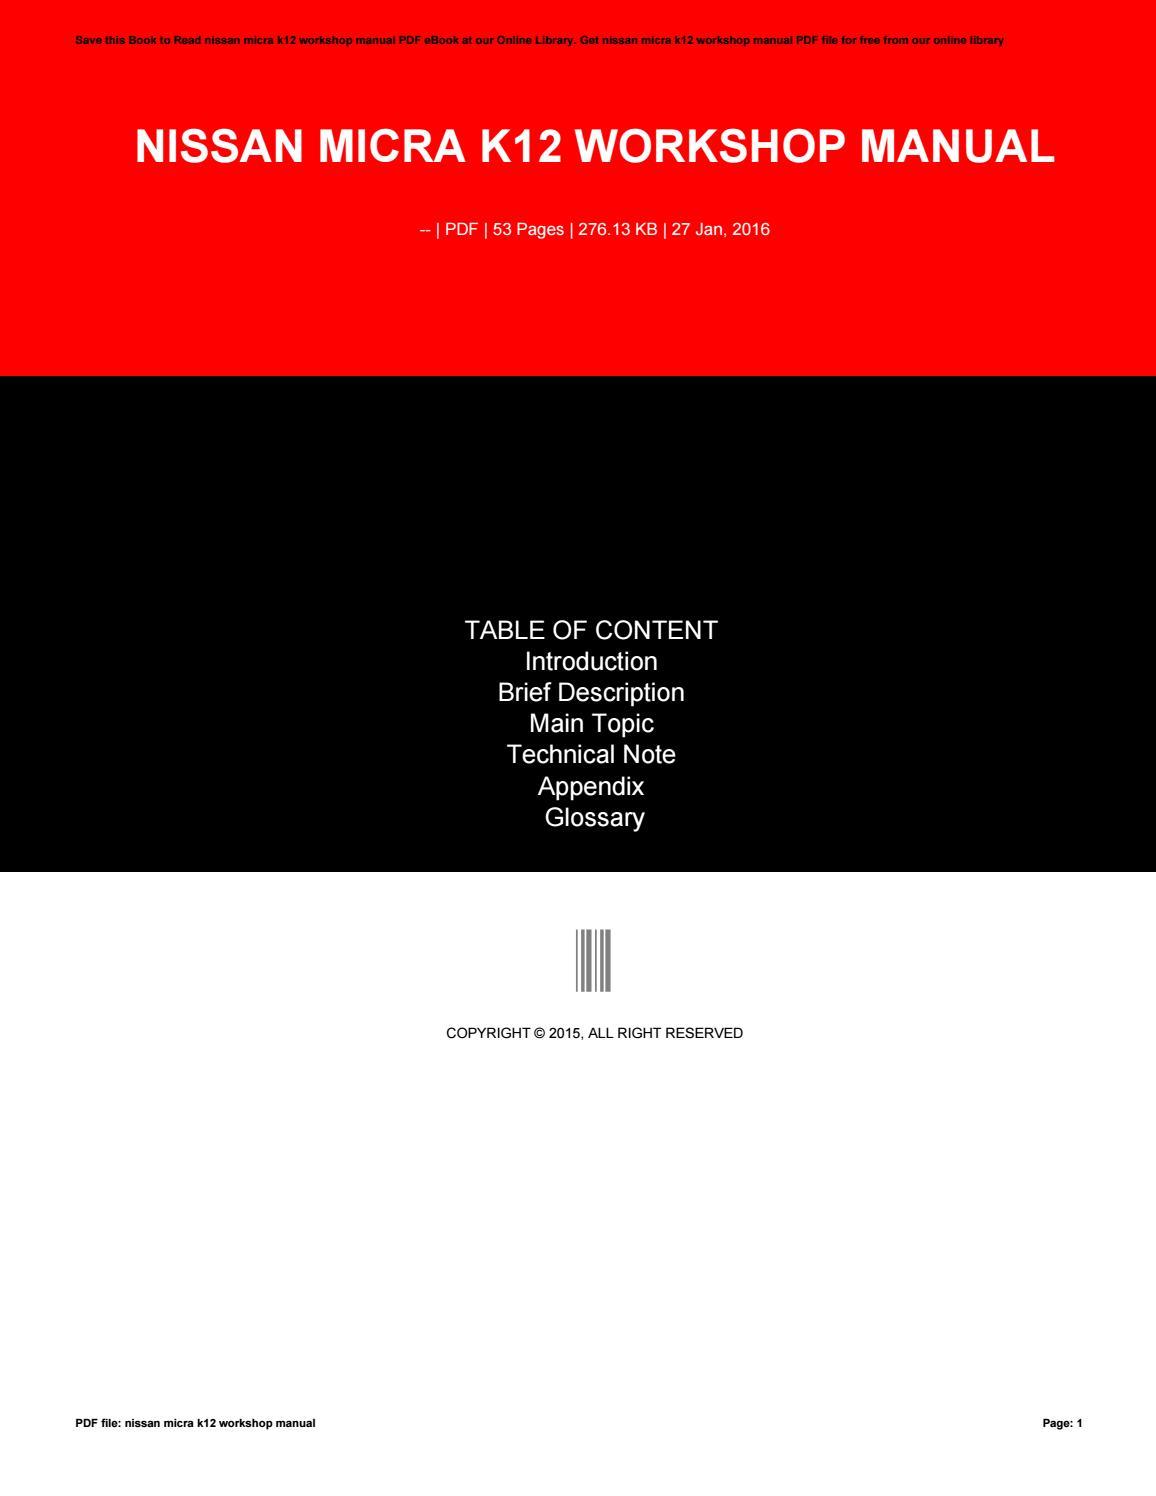 nissan micra manual pdf free